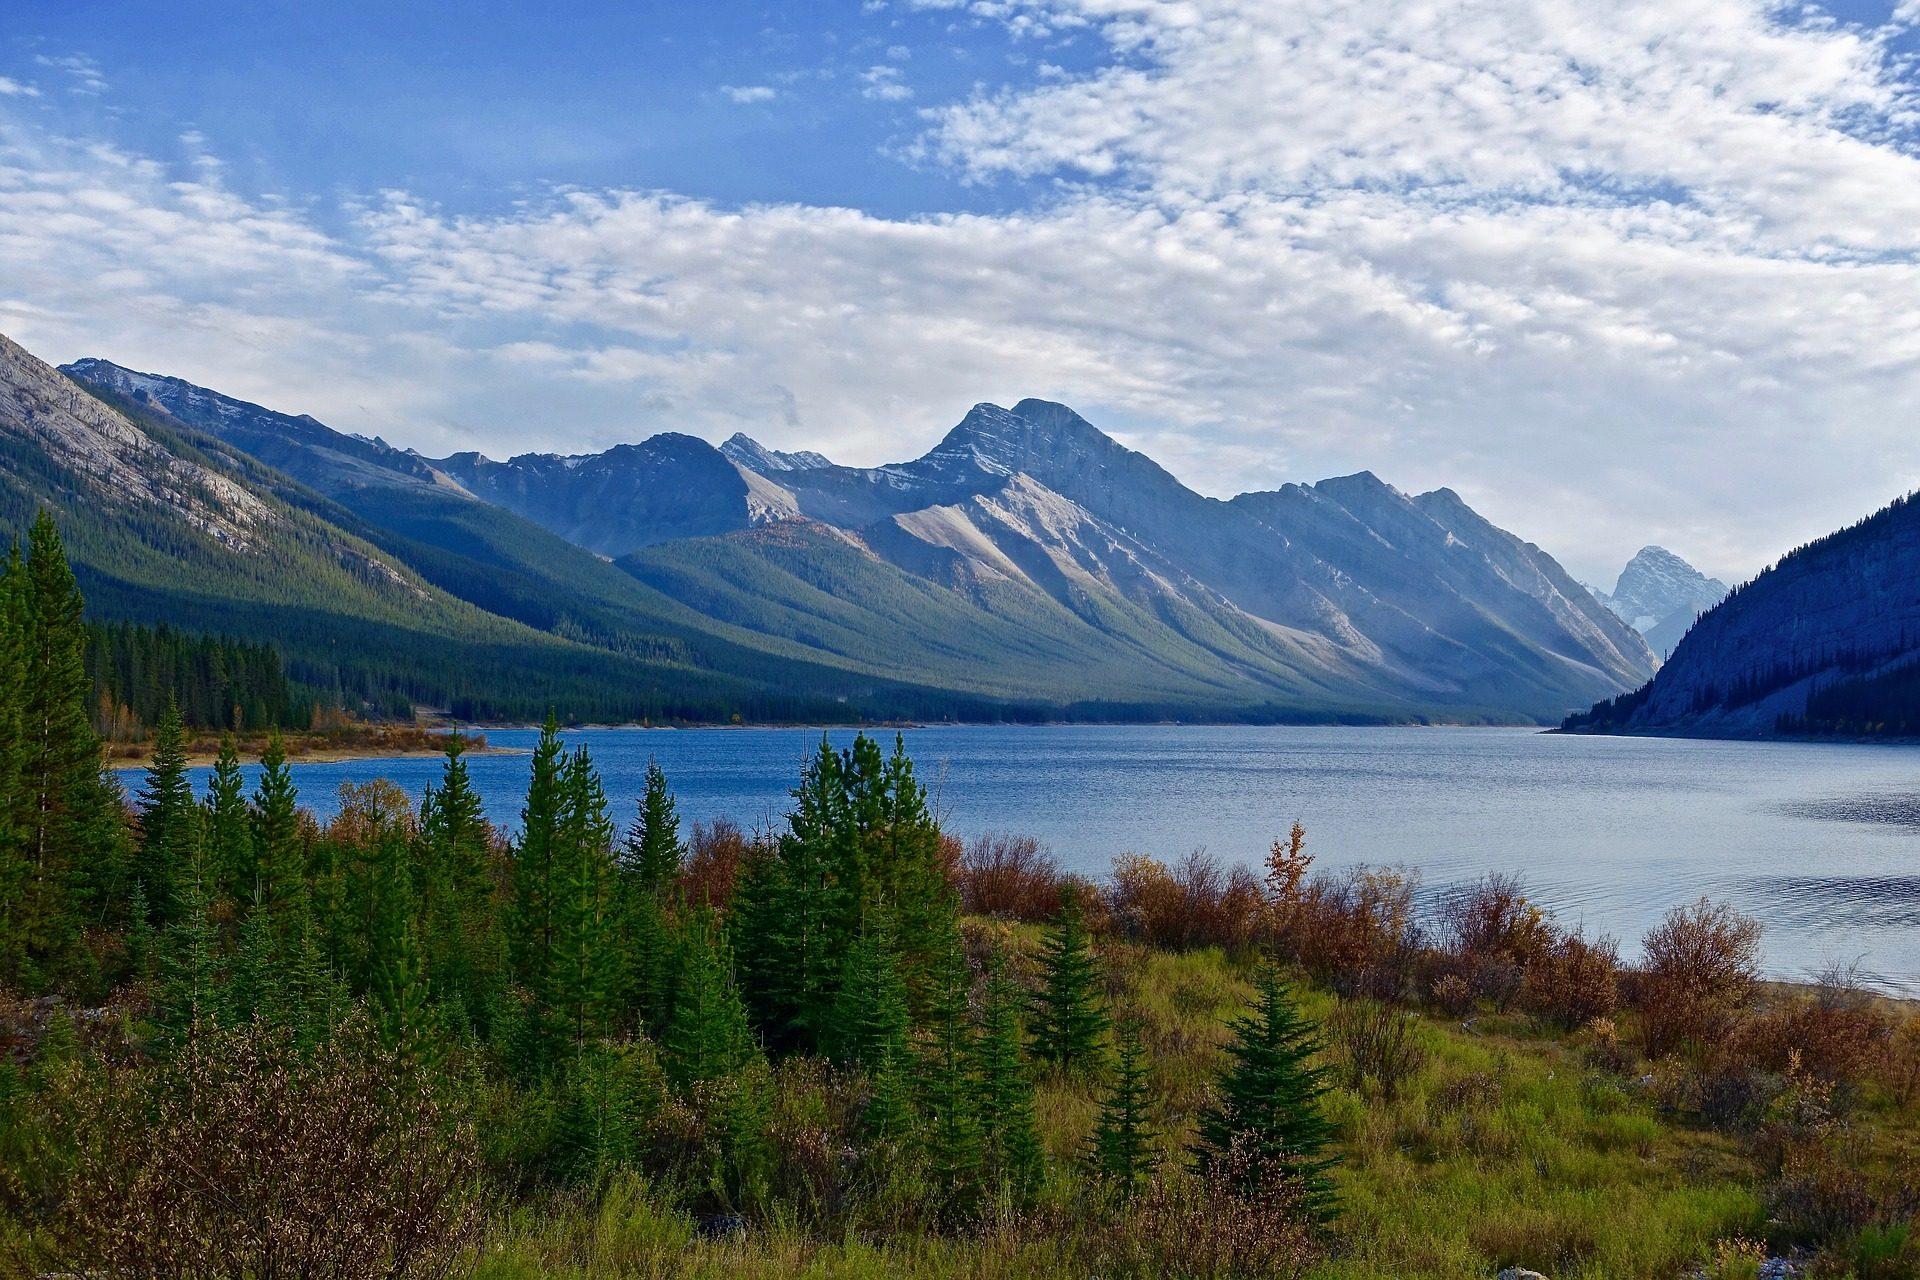 montañas, Lago, Pinheiro, árvores, Calma, serenidade - Papéis de parede HD - Professor-falken.com